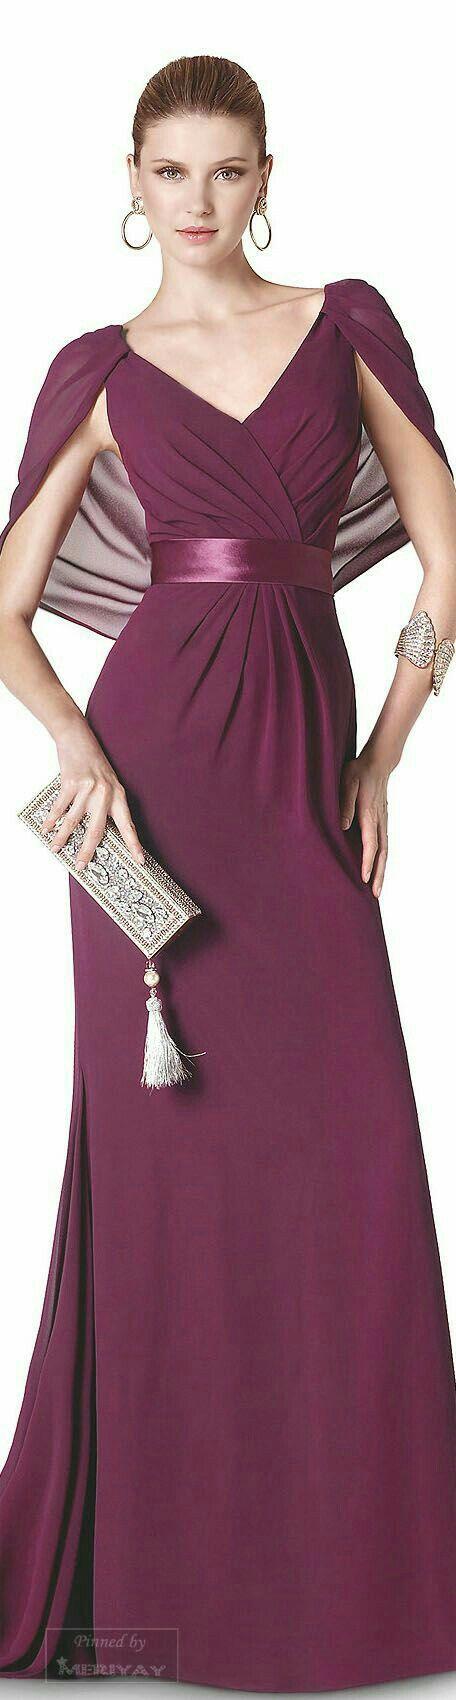 Pin by Aura Reyes on Vestidos largos y cortos   Pinterest   Elegant ...